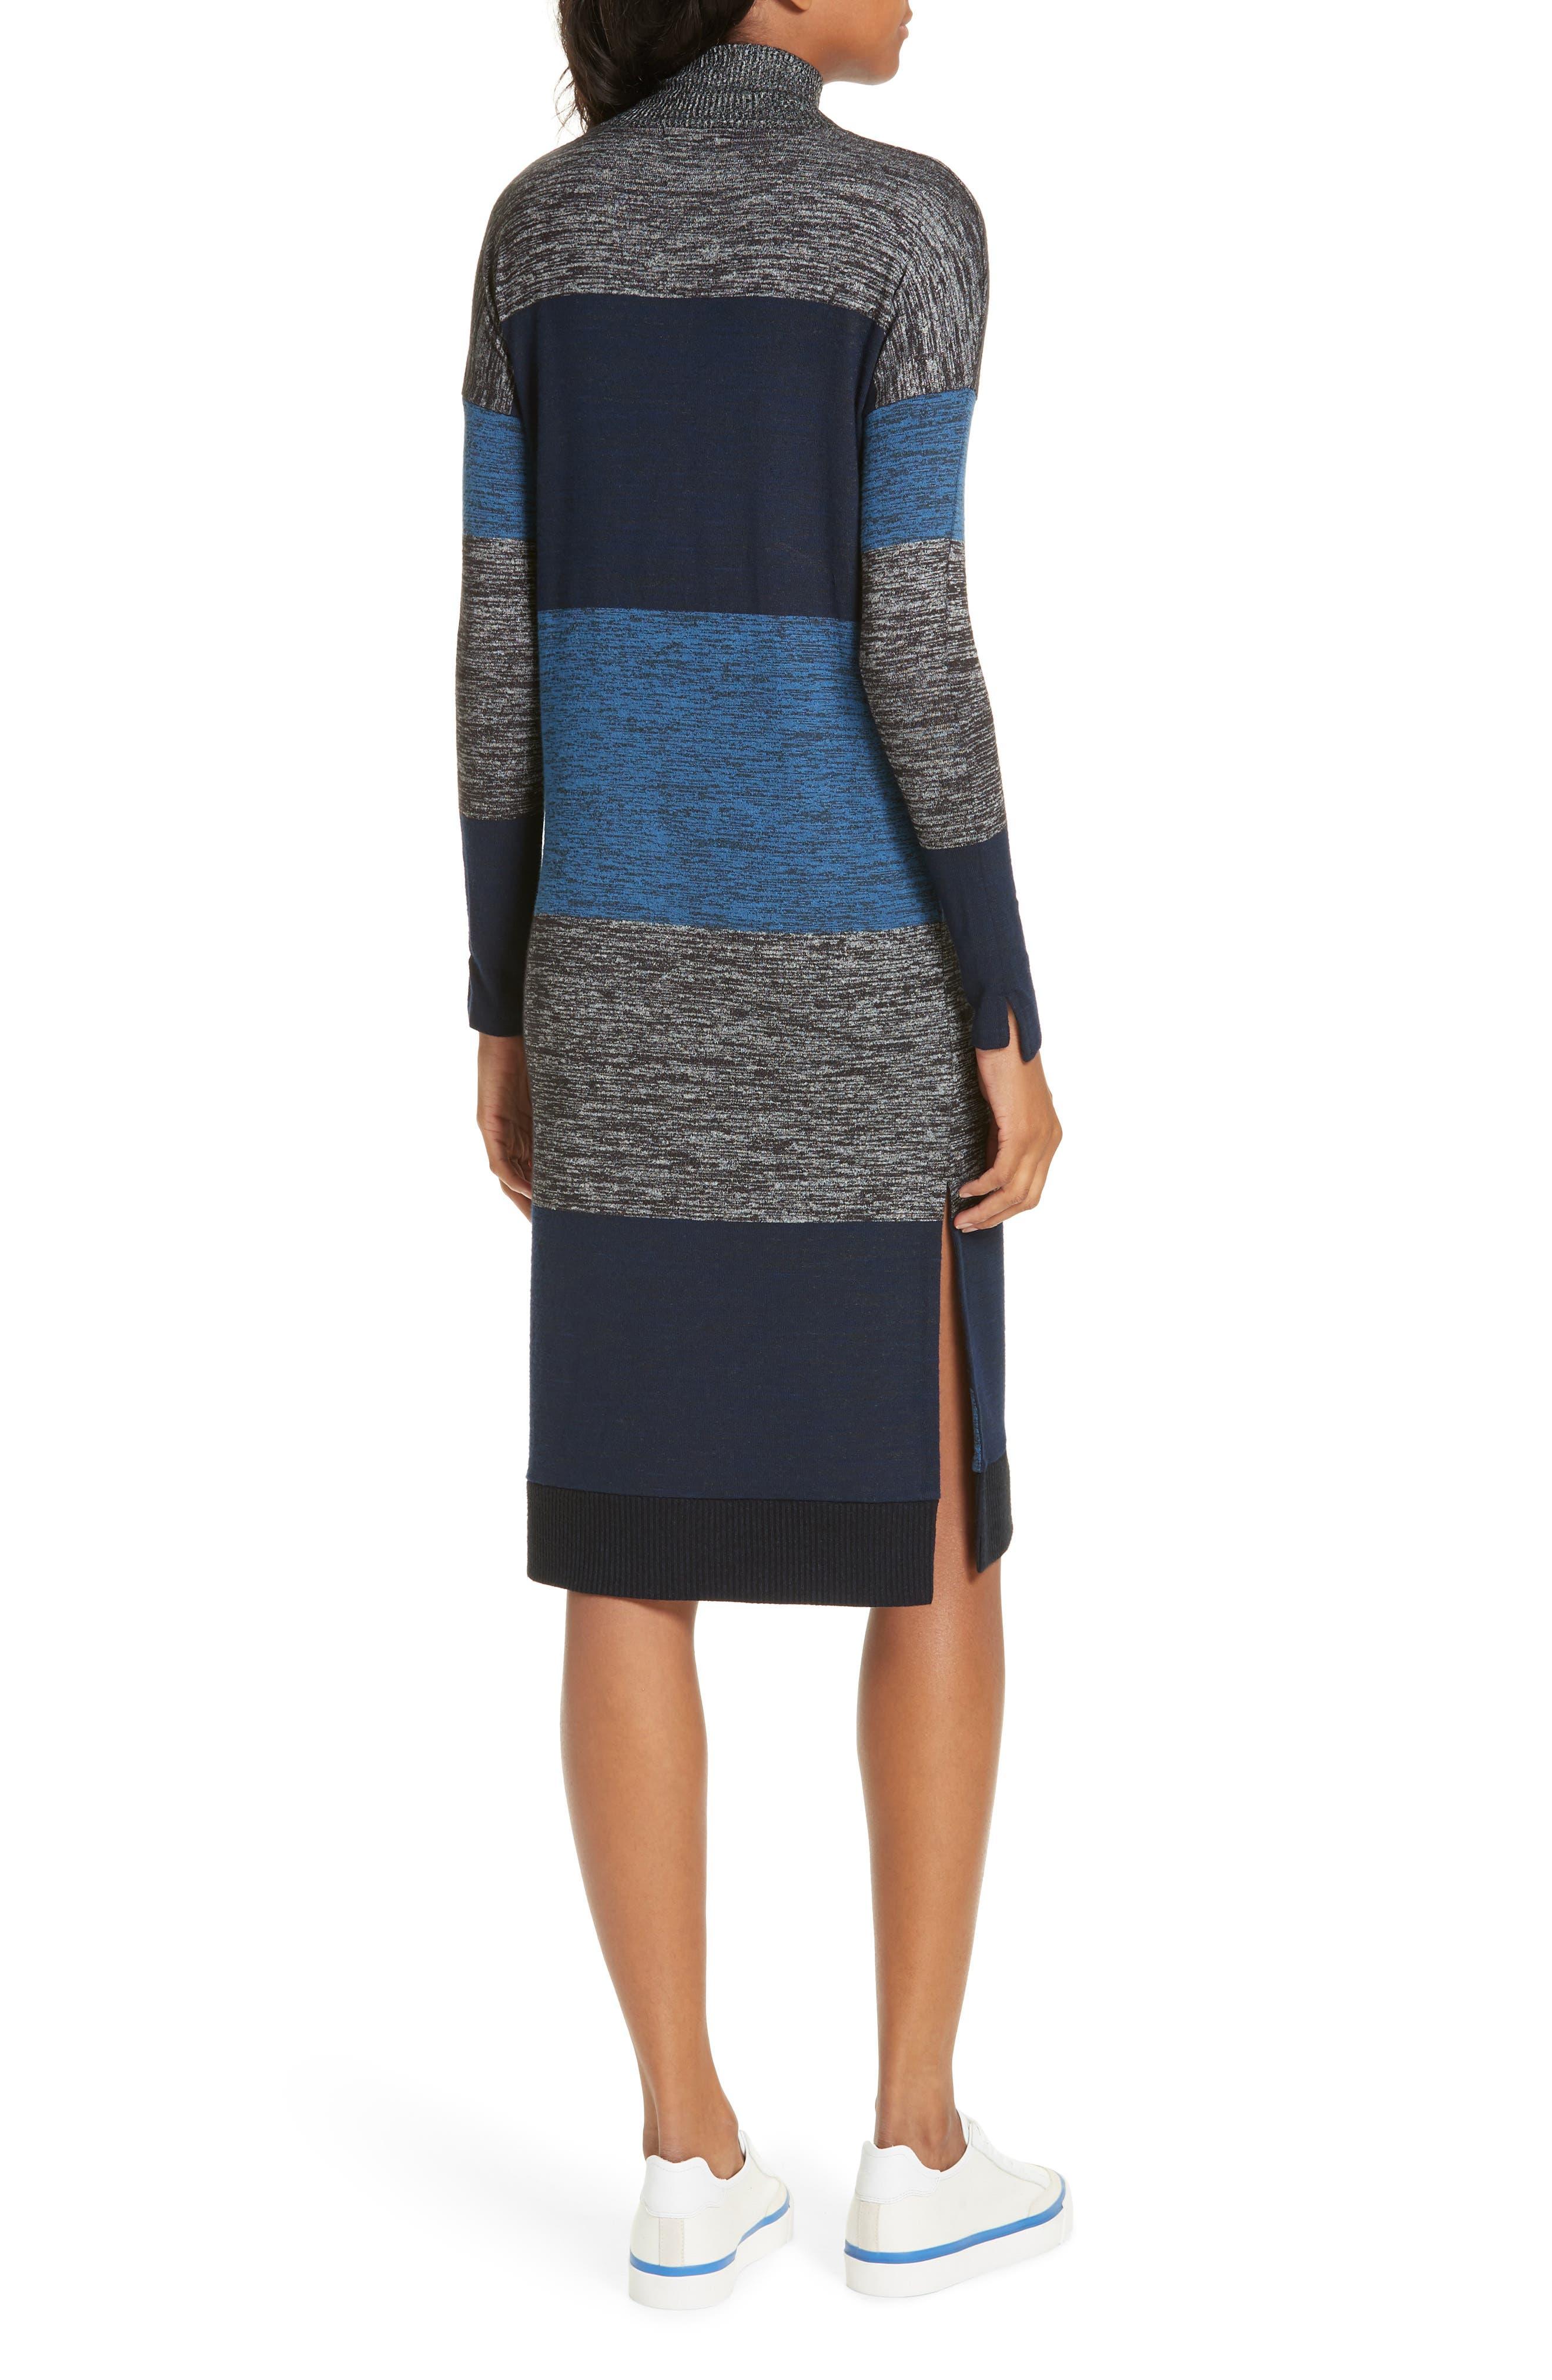 rag & bone Bowery Stripe Turtleneck Sweater Dress,                             Alternate thumbnail 2, color,                             BLUE STRIPE